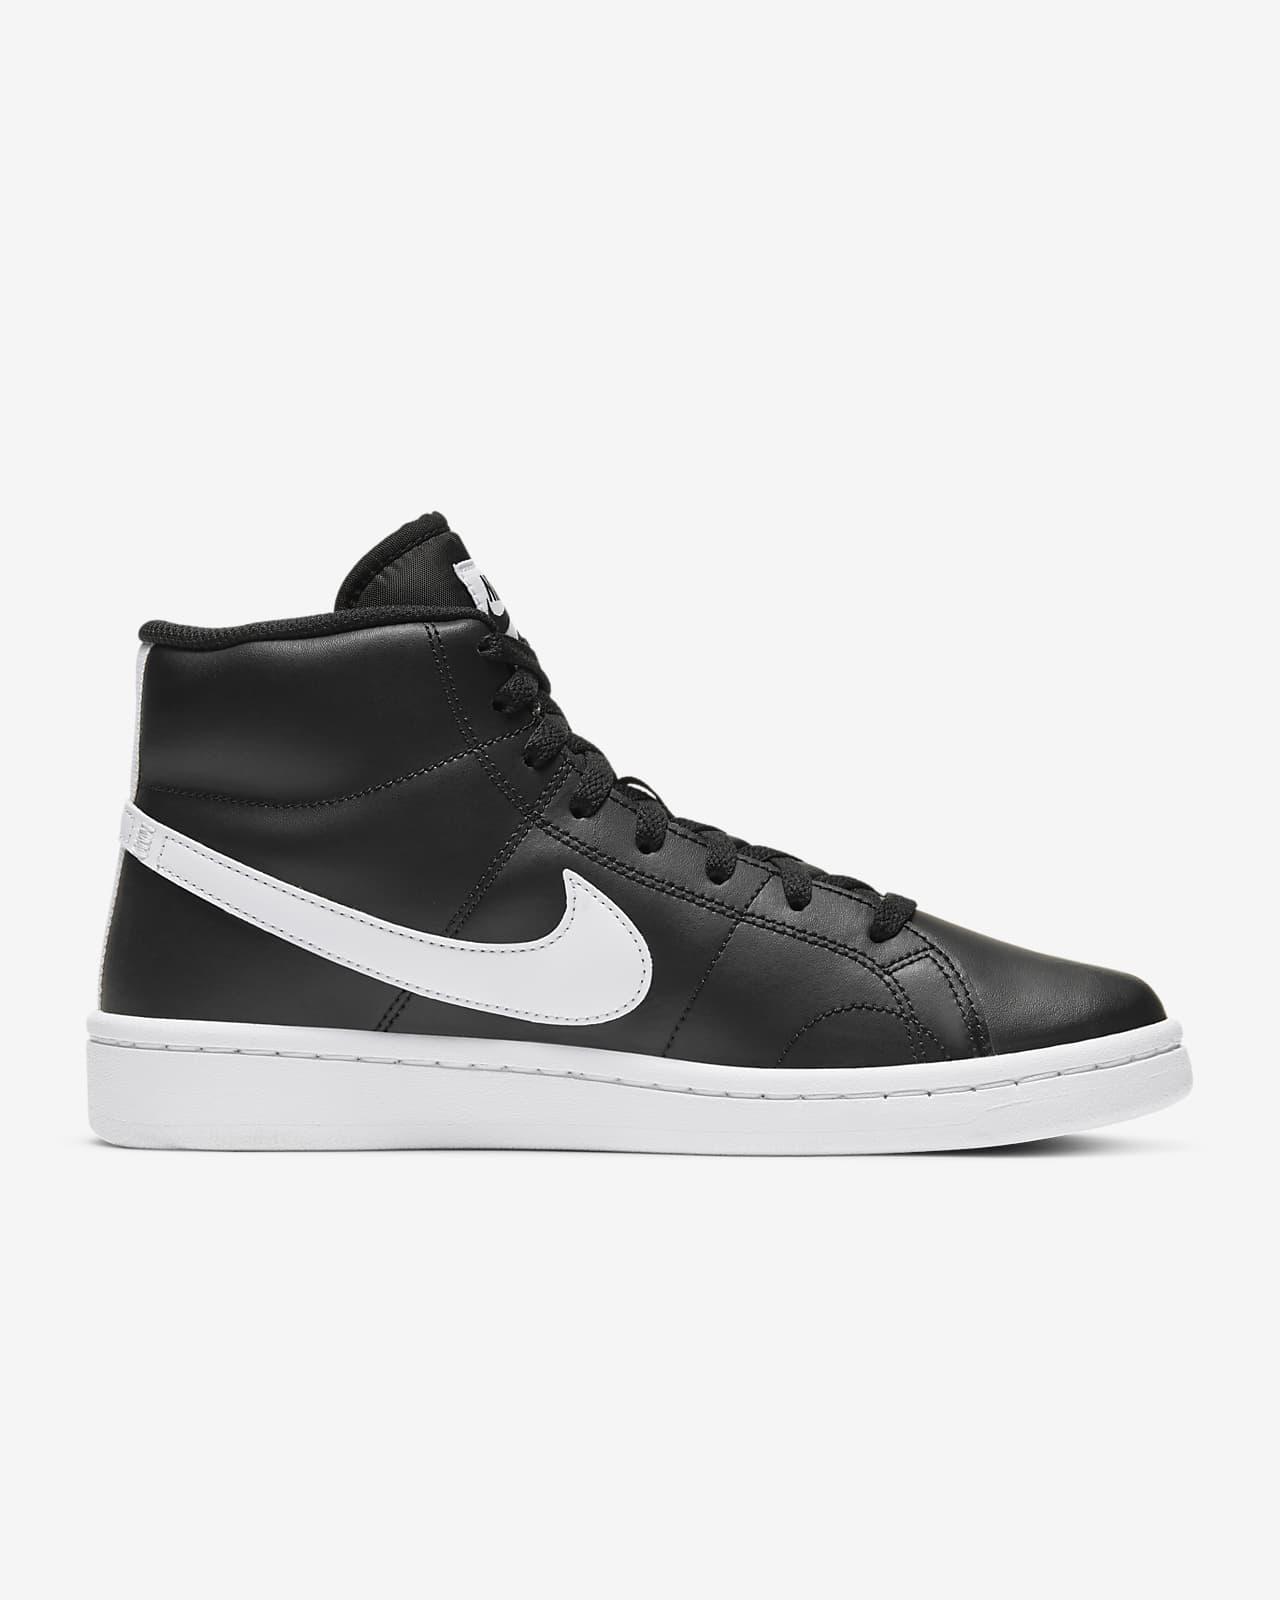 es bonito Inodoro Monica  Nike Court Royale 2 Mid Women's Shoe. Nike LU